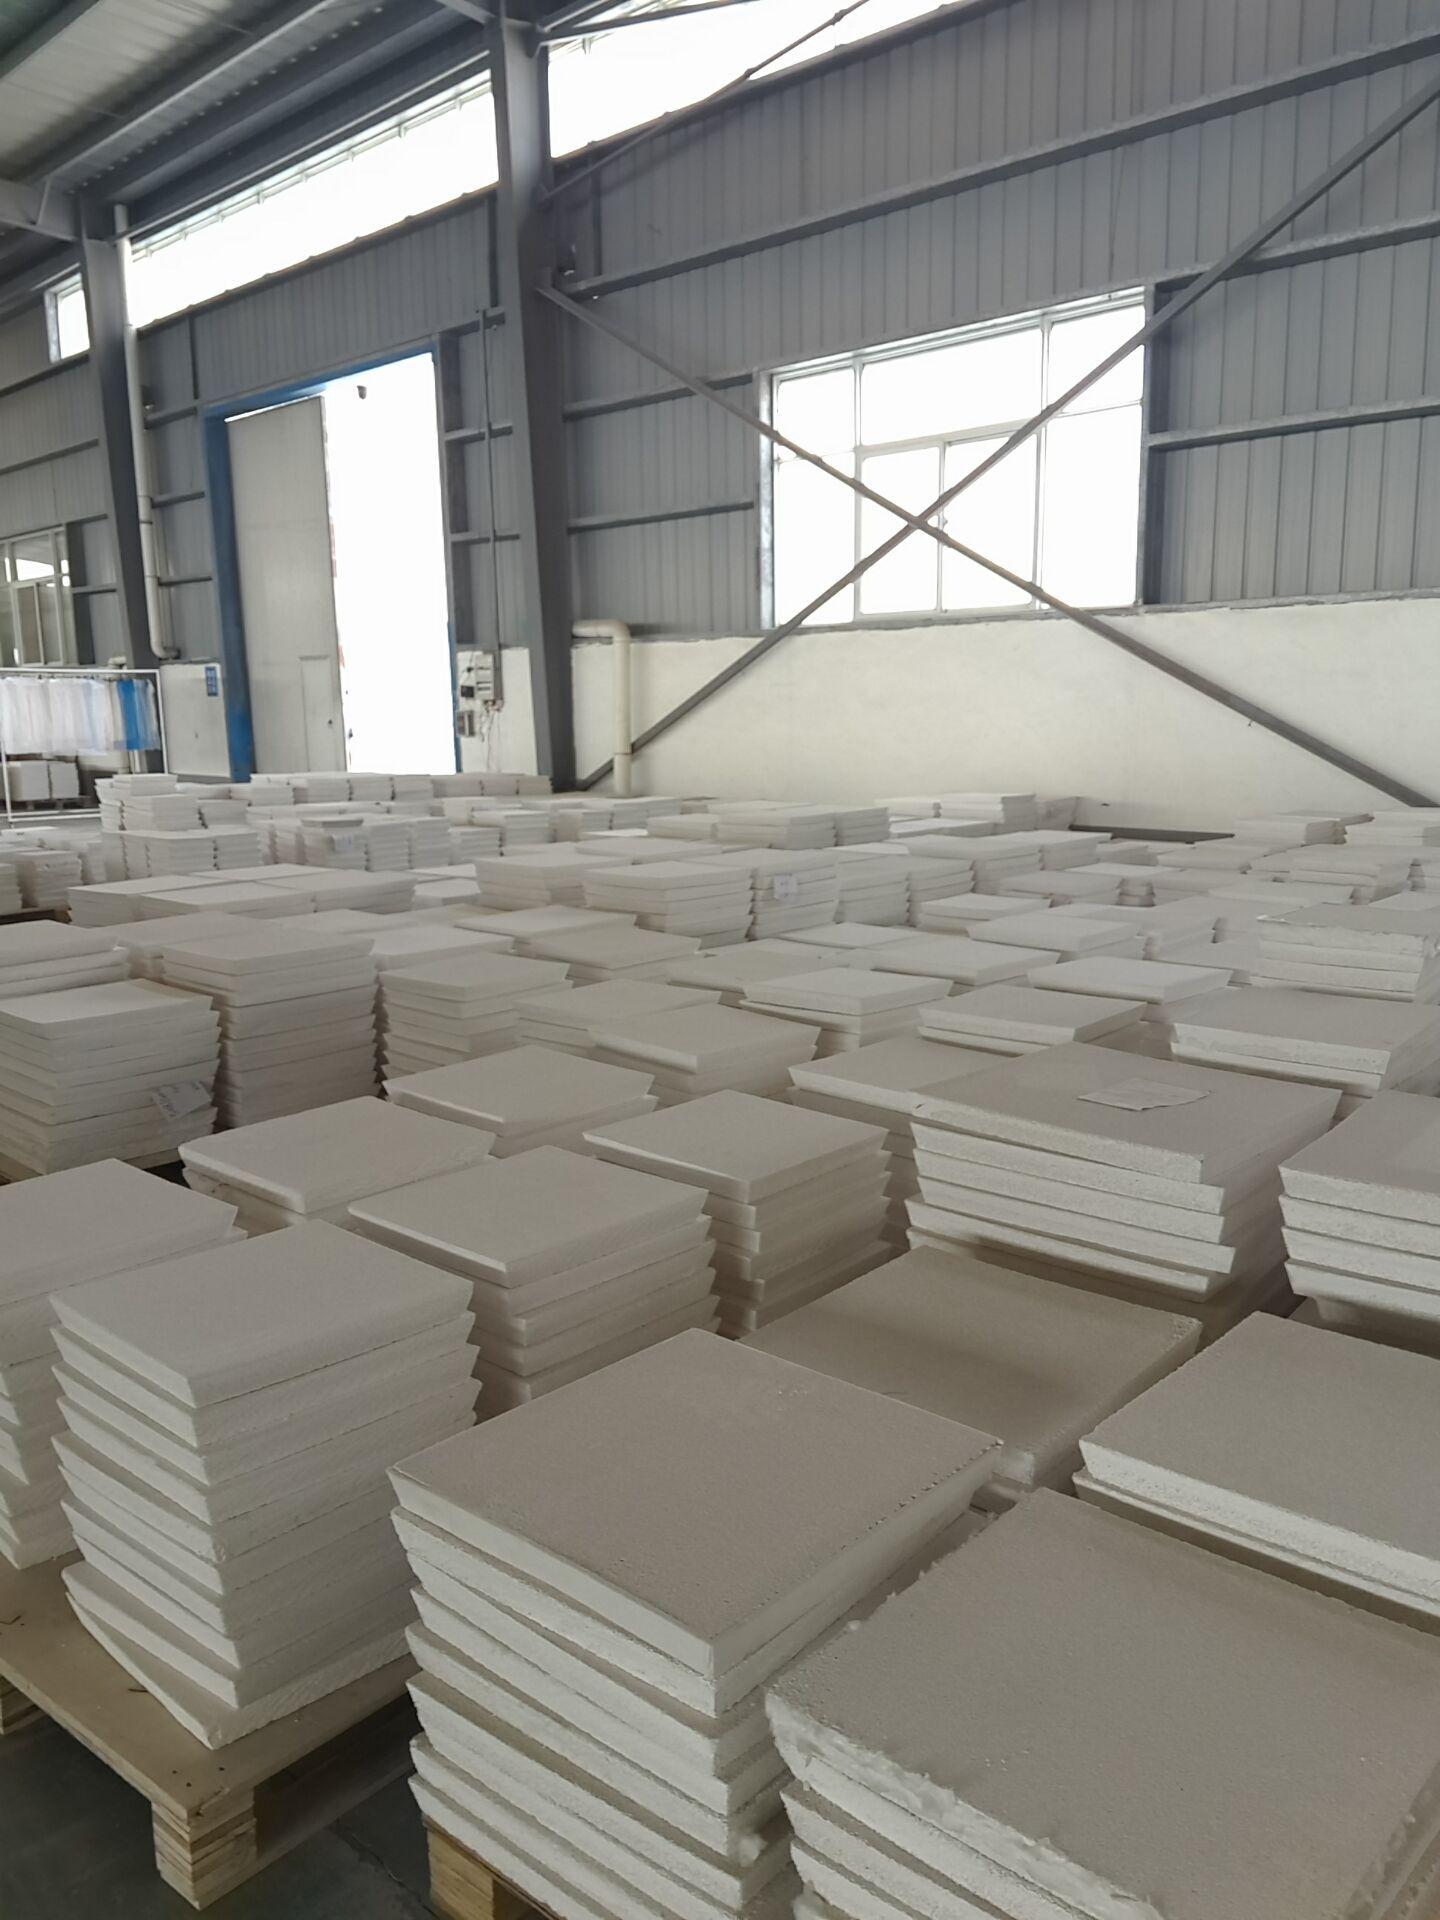 Dubai Aluminium Company Ltd V Salaam 2003 Ac366 Archives